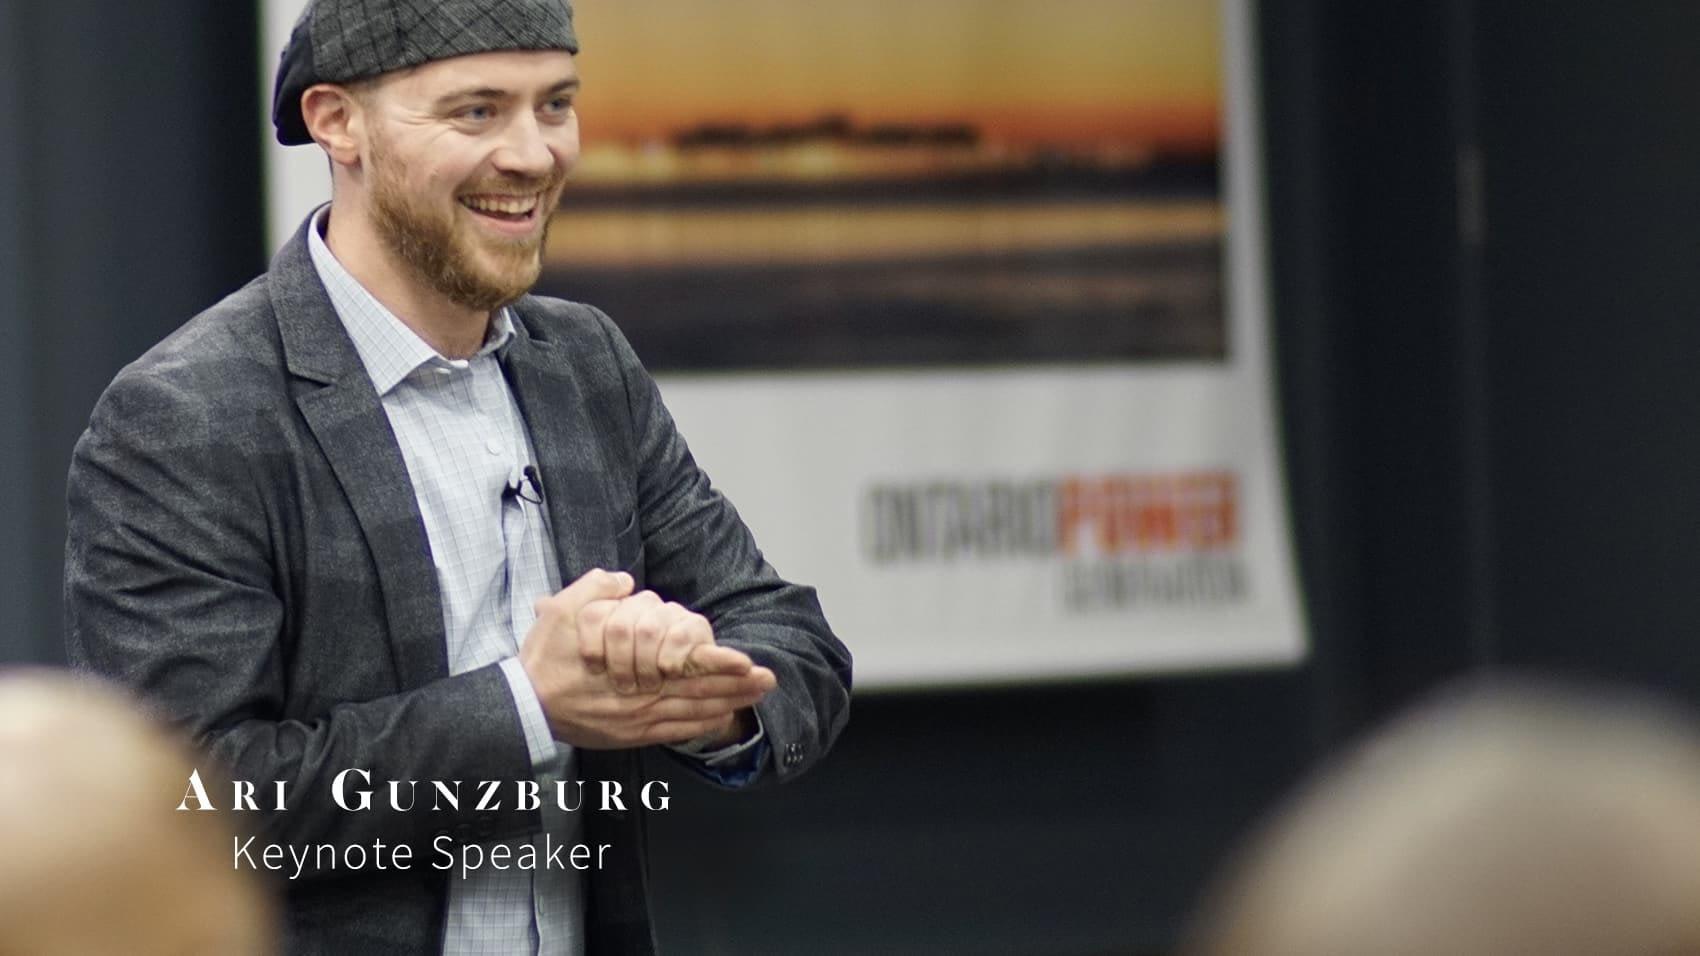 Ari Gunzburg short speaking reel